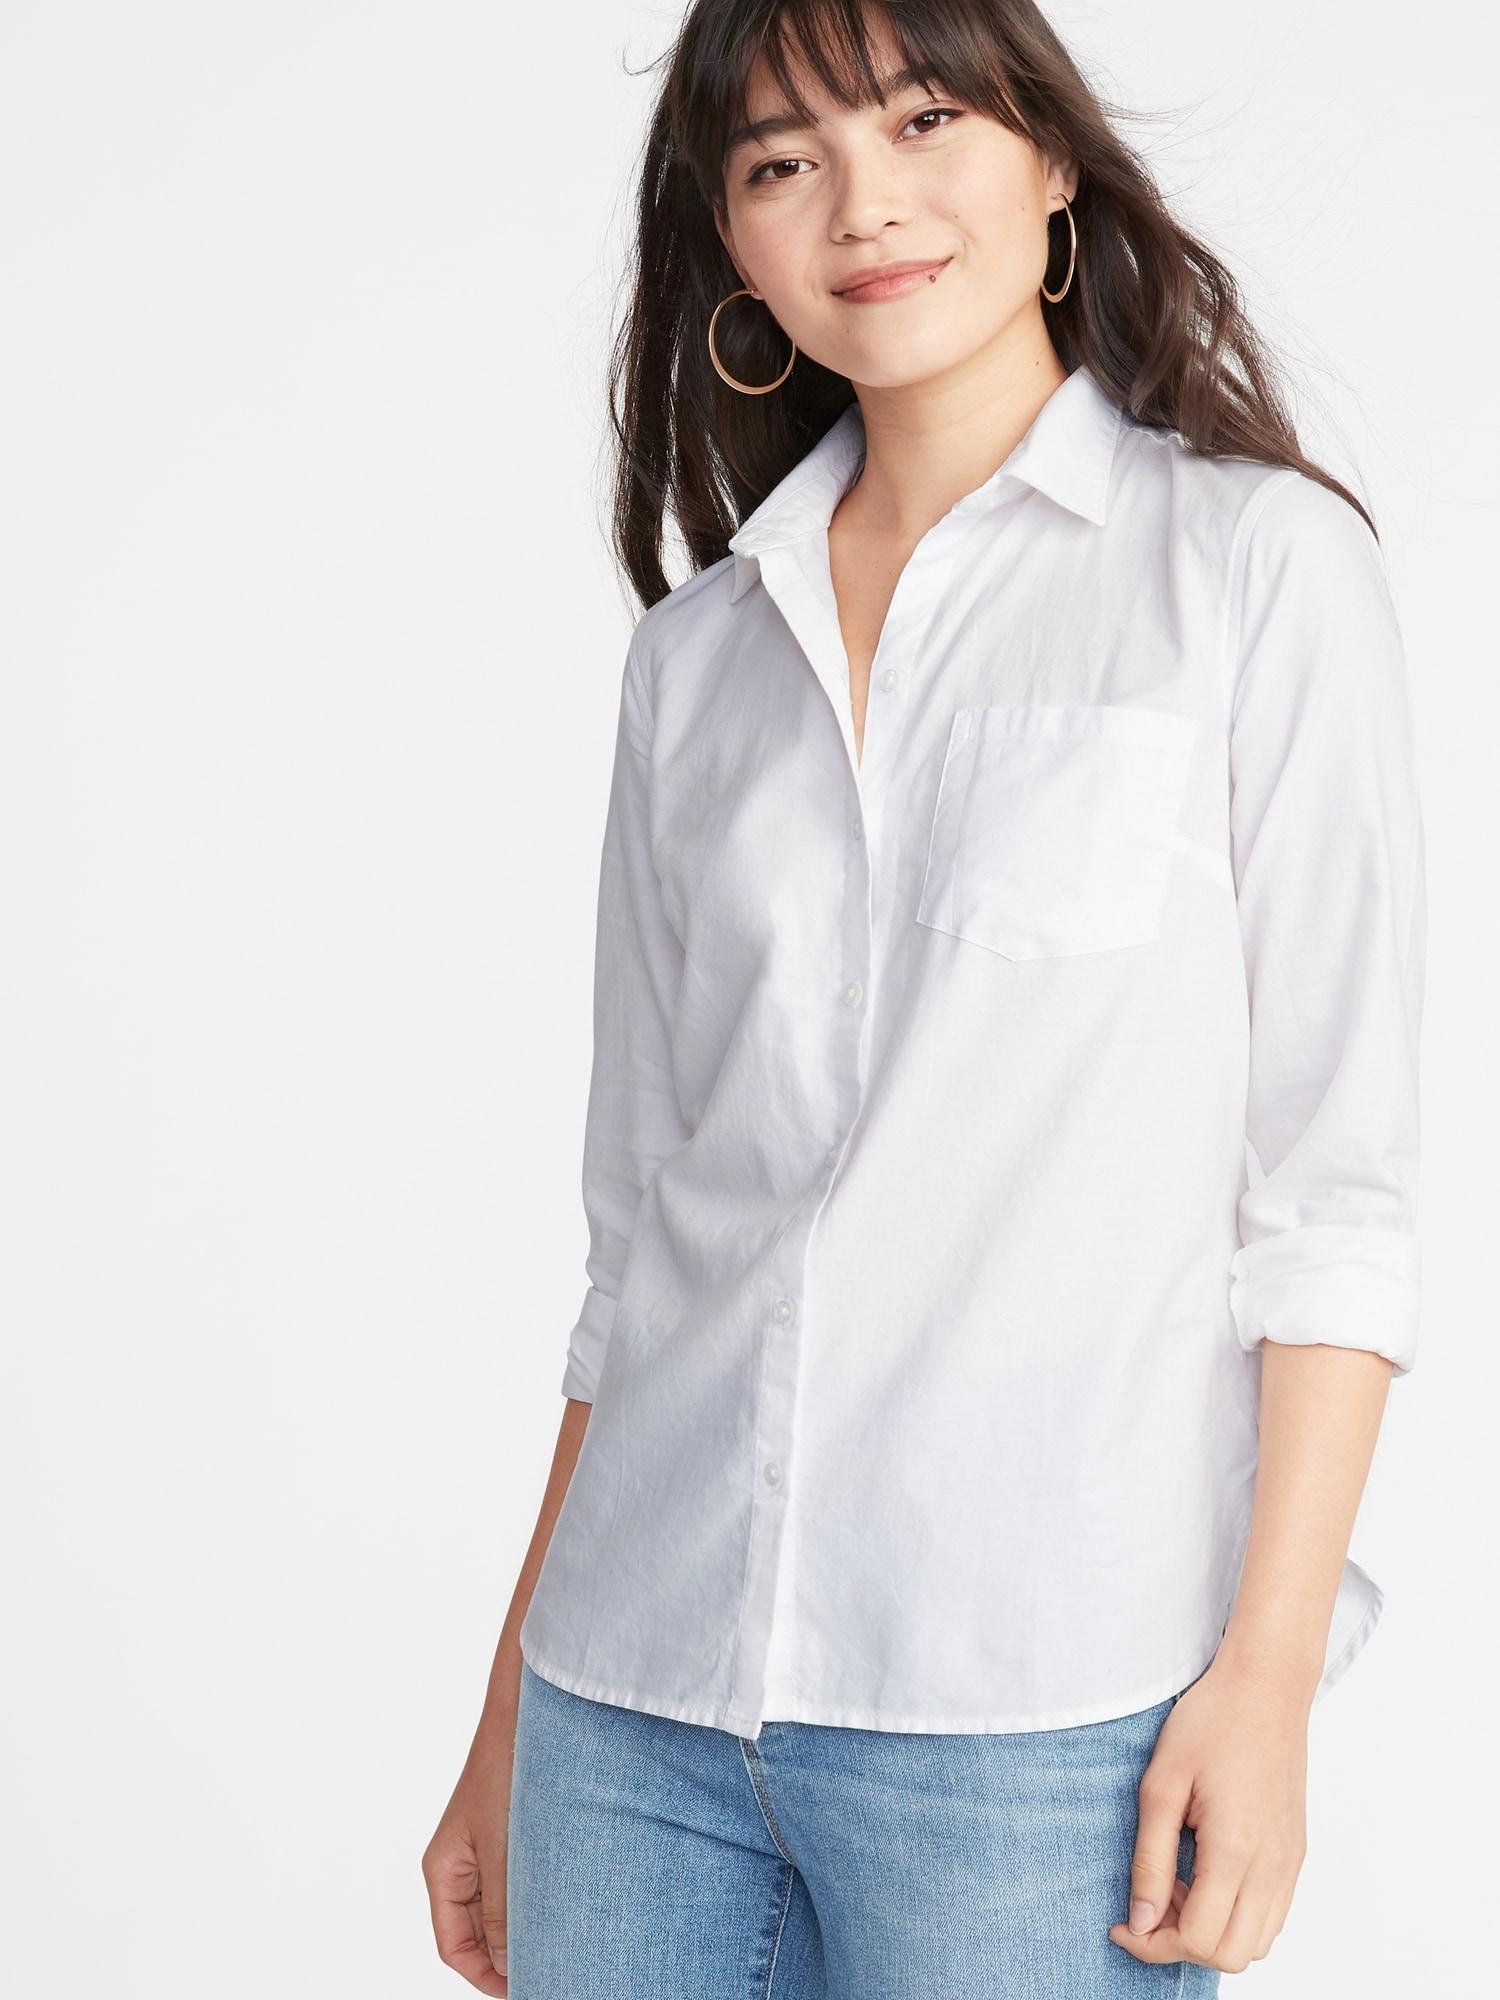 c5e41d2e165 Relaxed Classic Shirt for Women